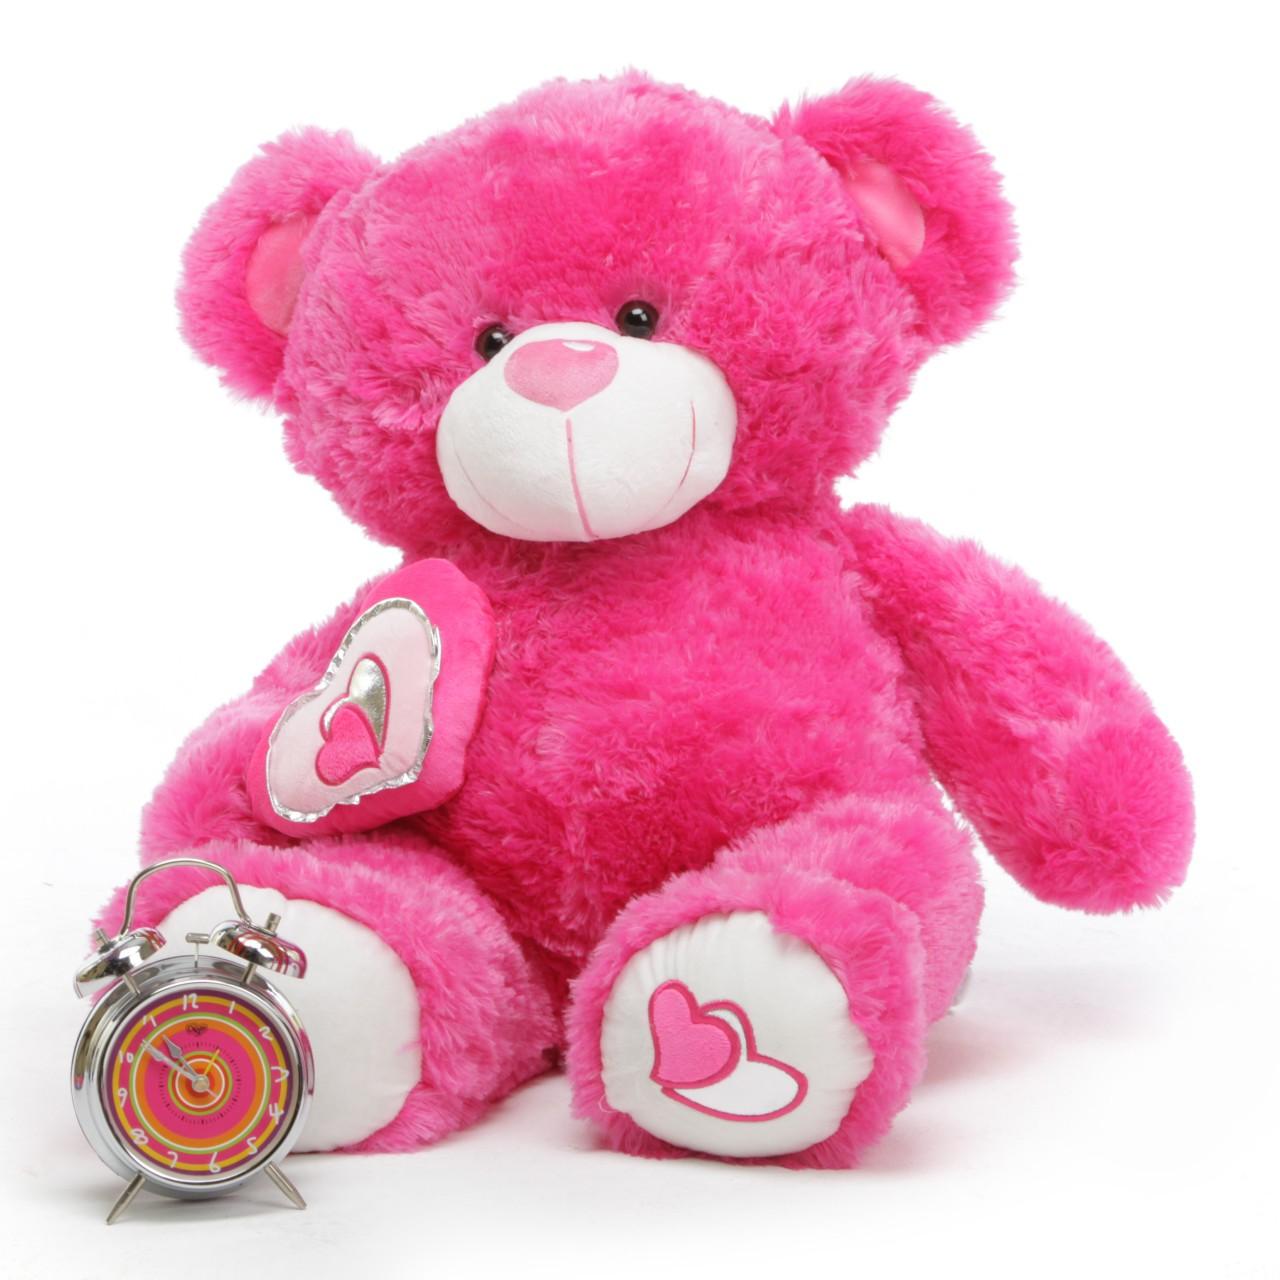 Best Gift For Girlfriend